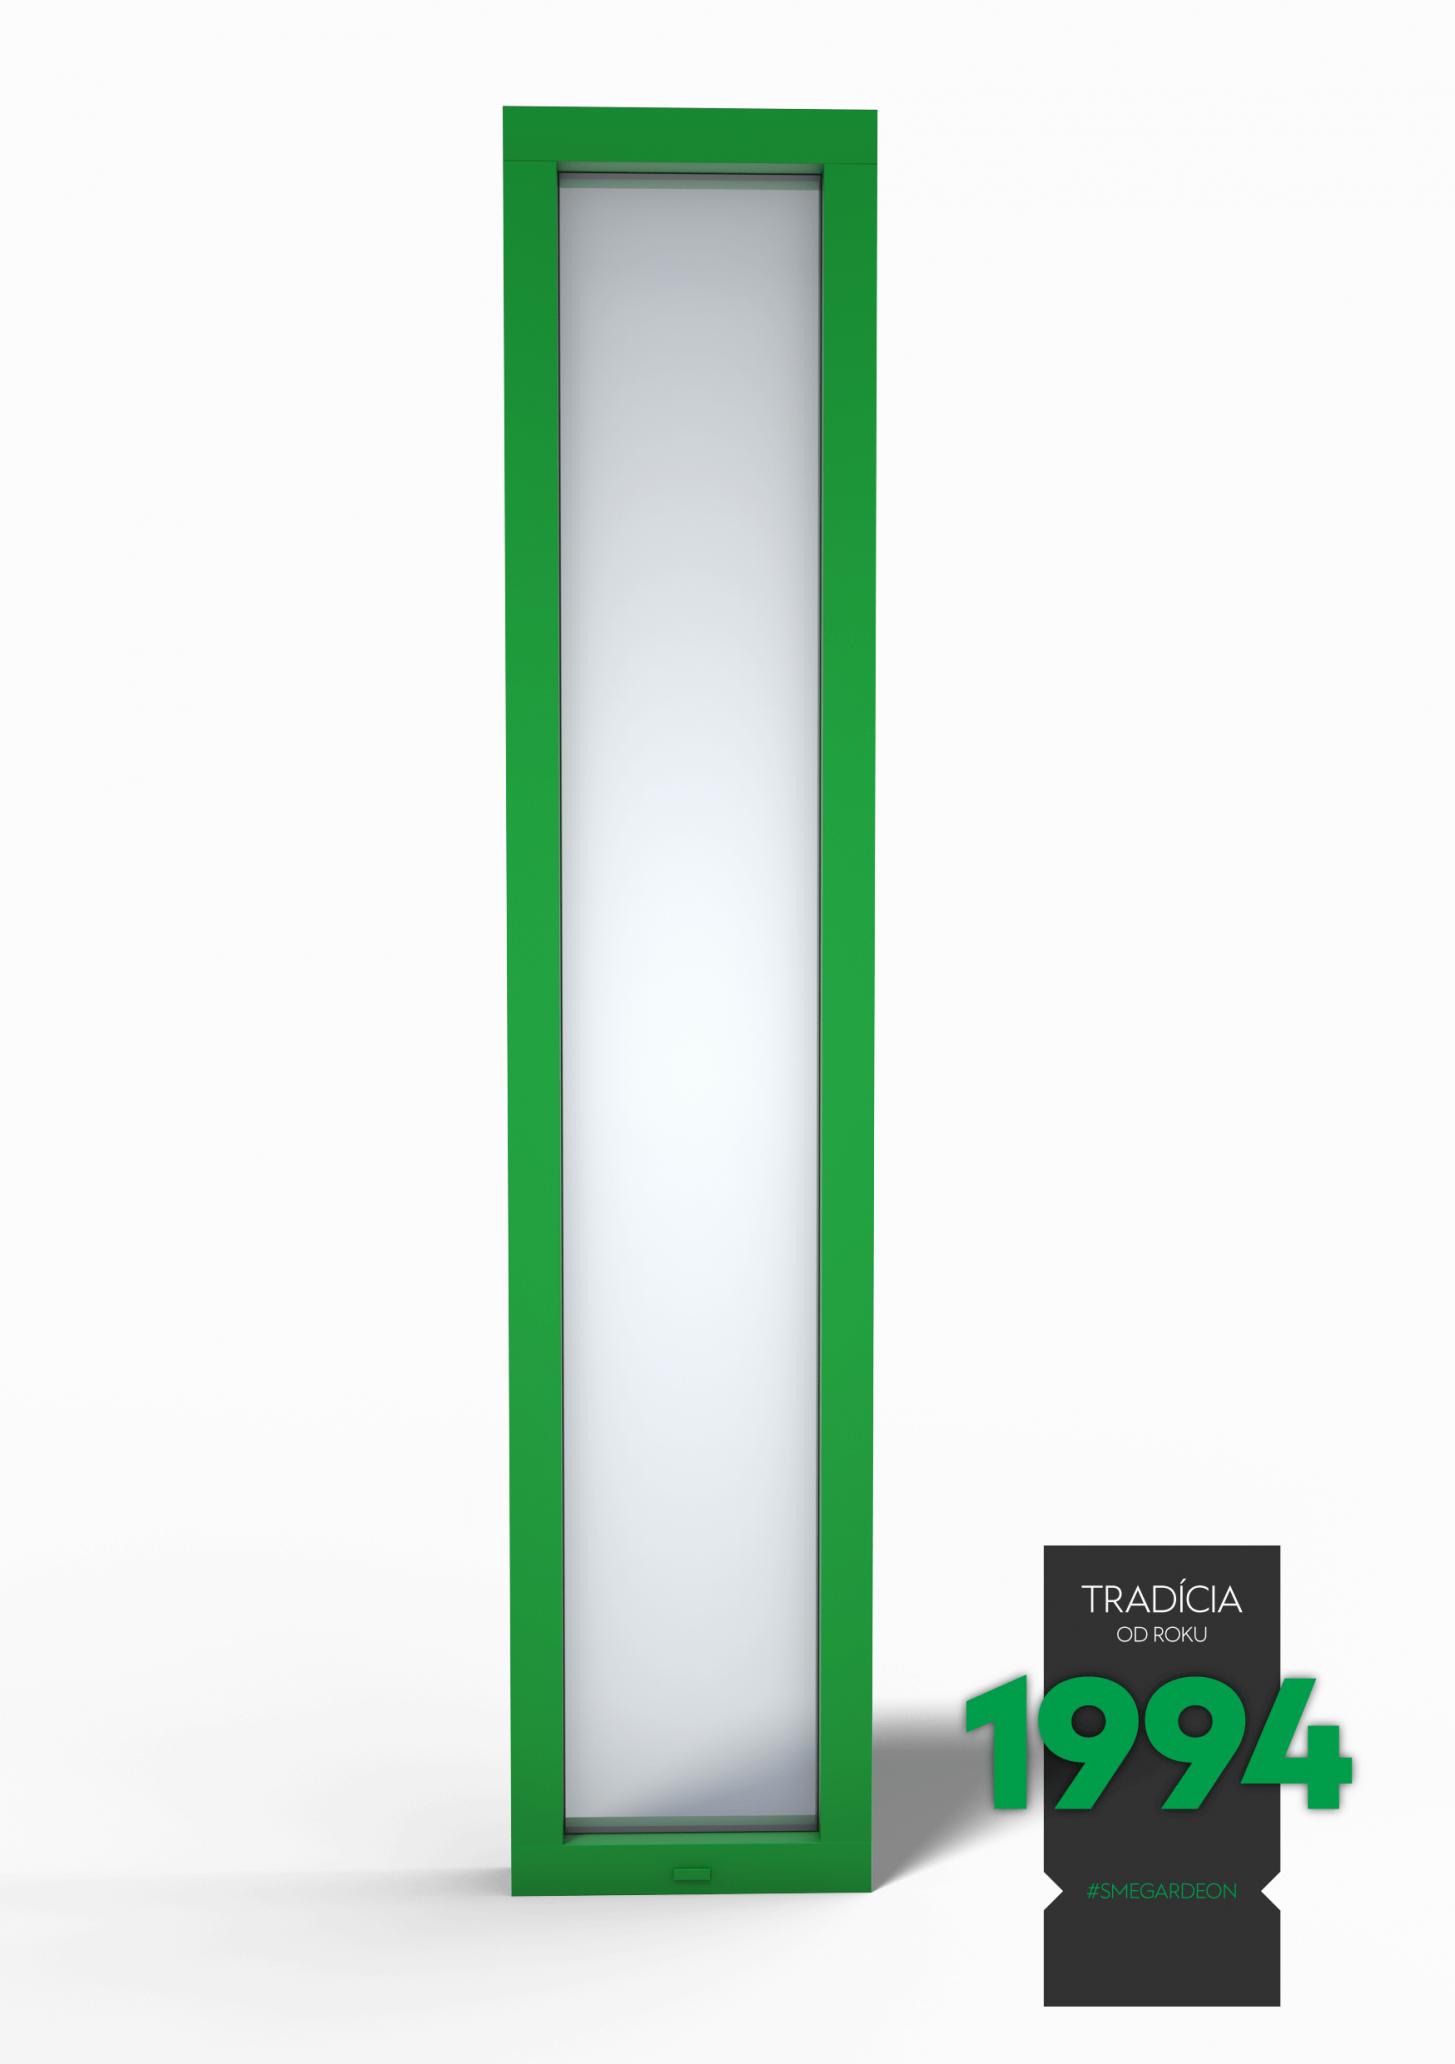 Svetlík GARDEON v gardeon zelenej farbe